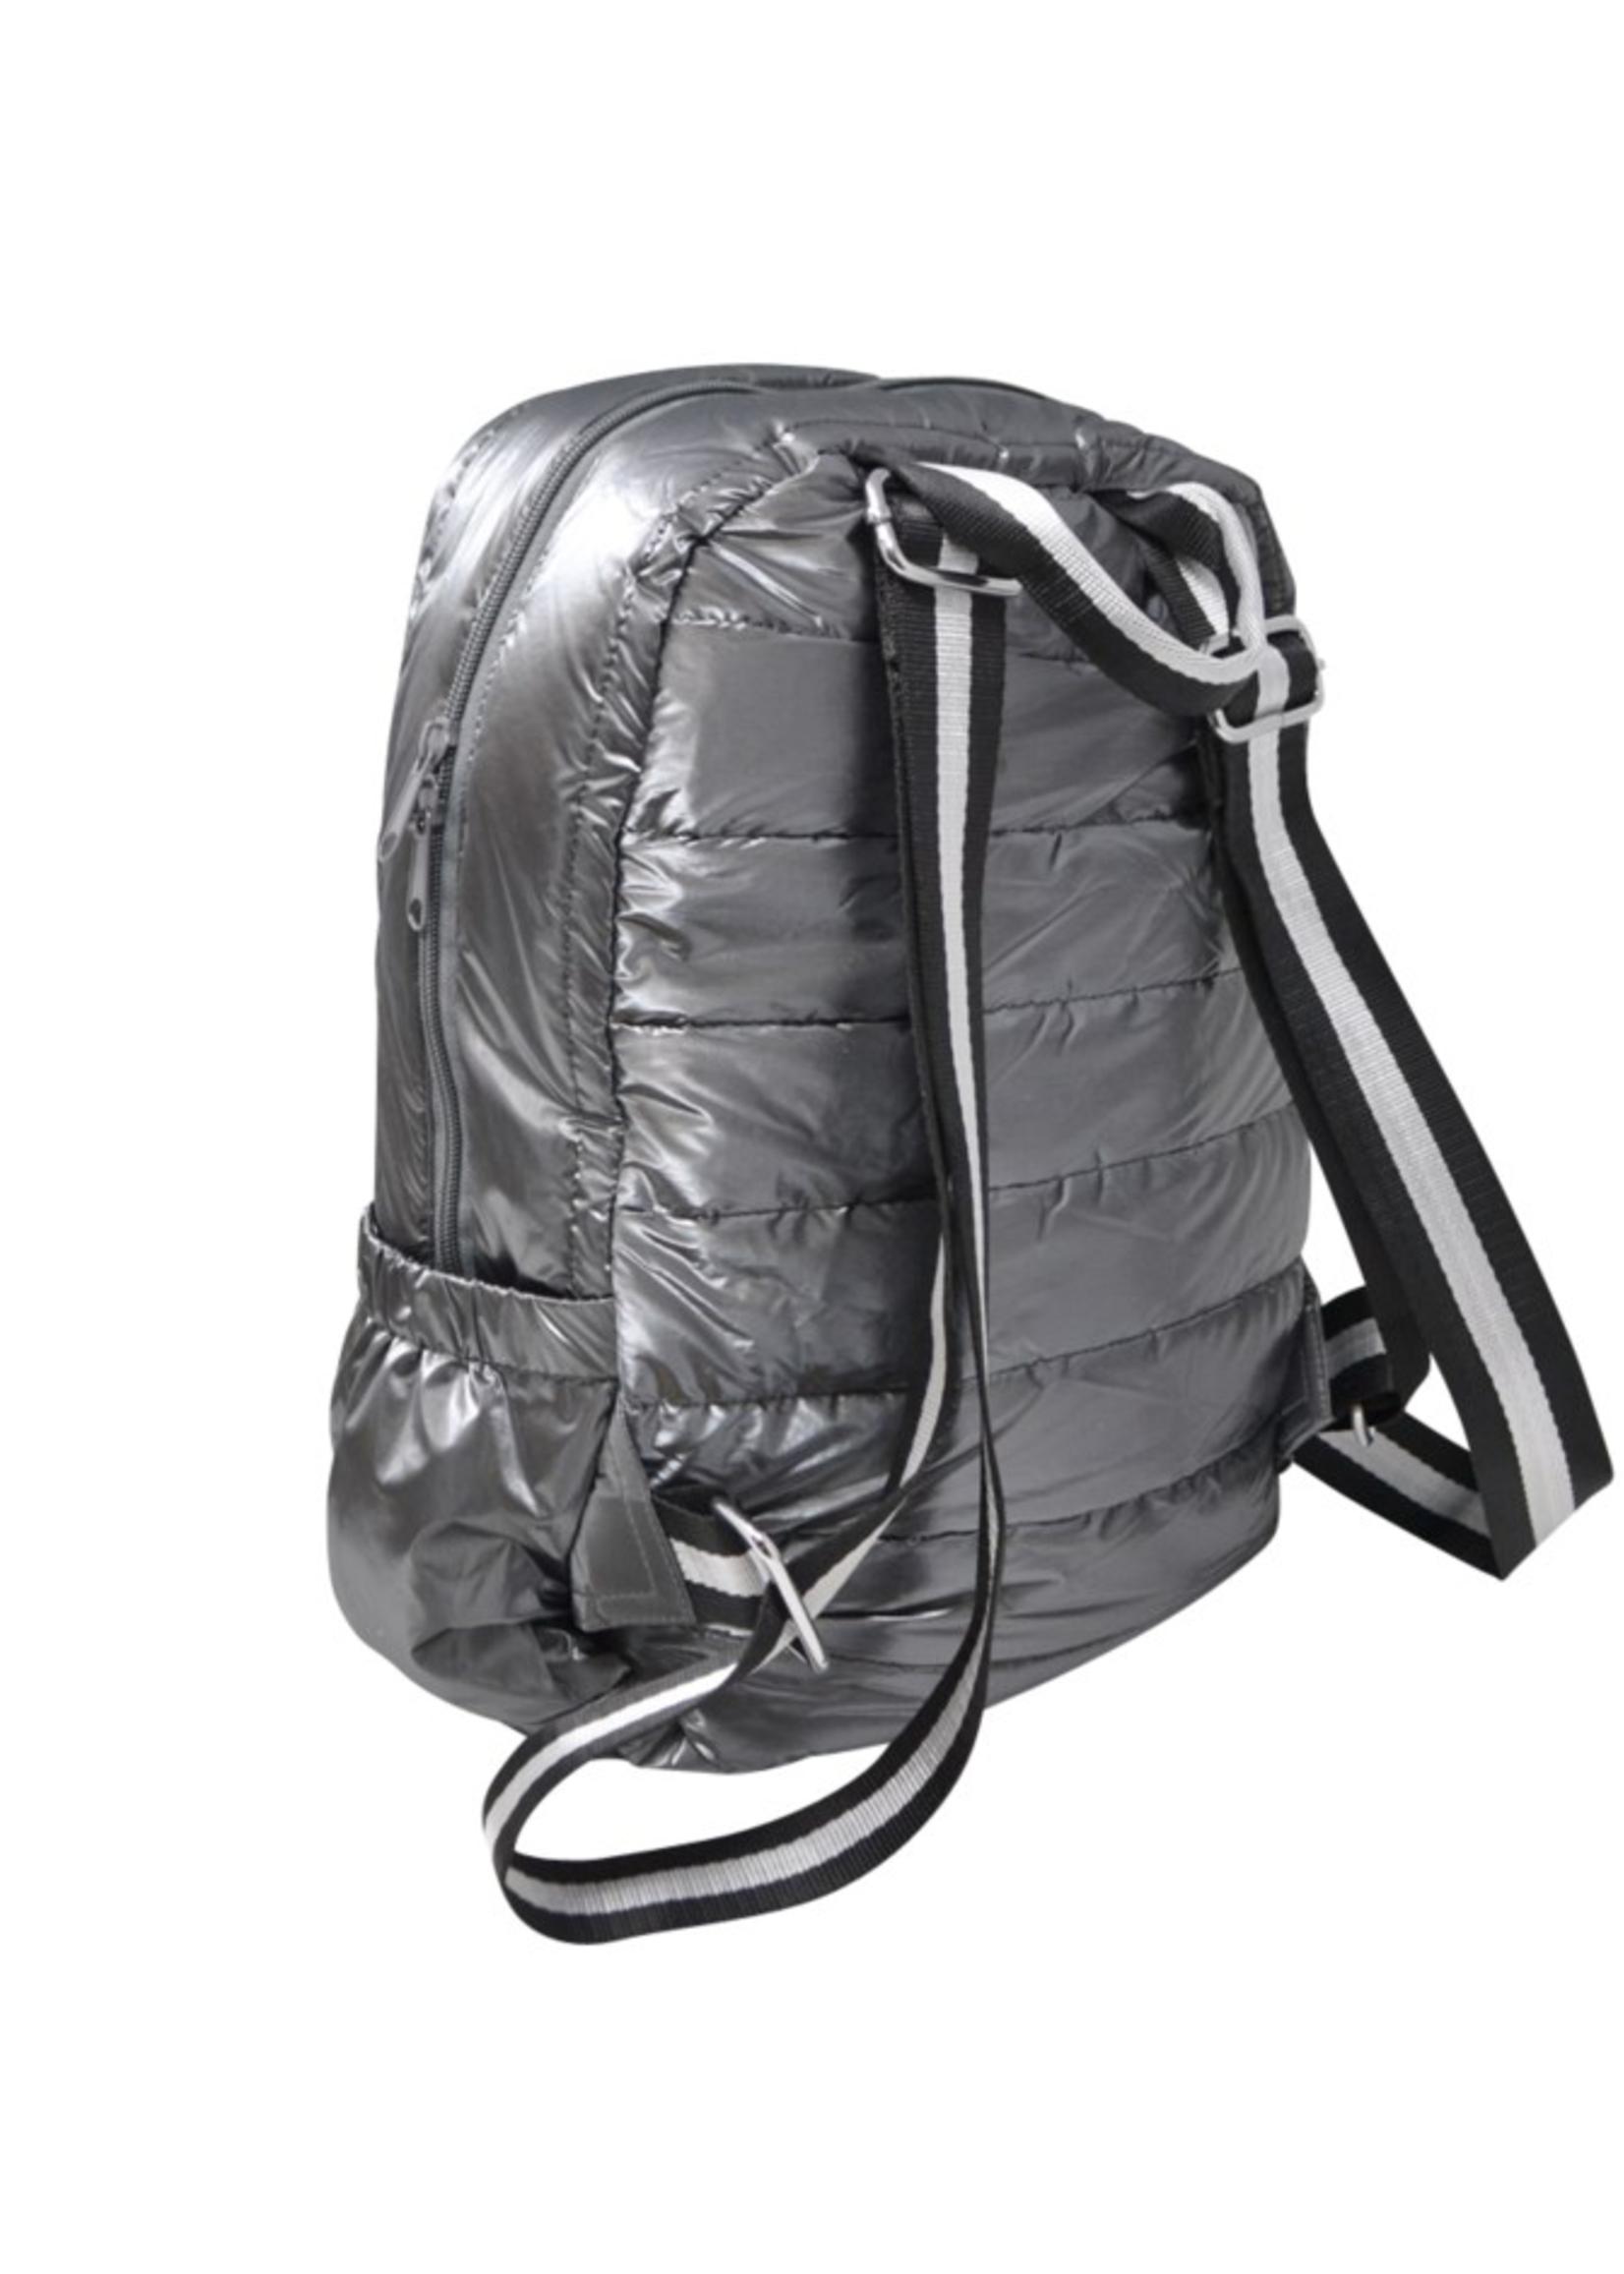 Puffer Backpack Gray/Black